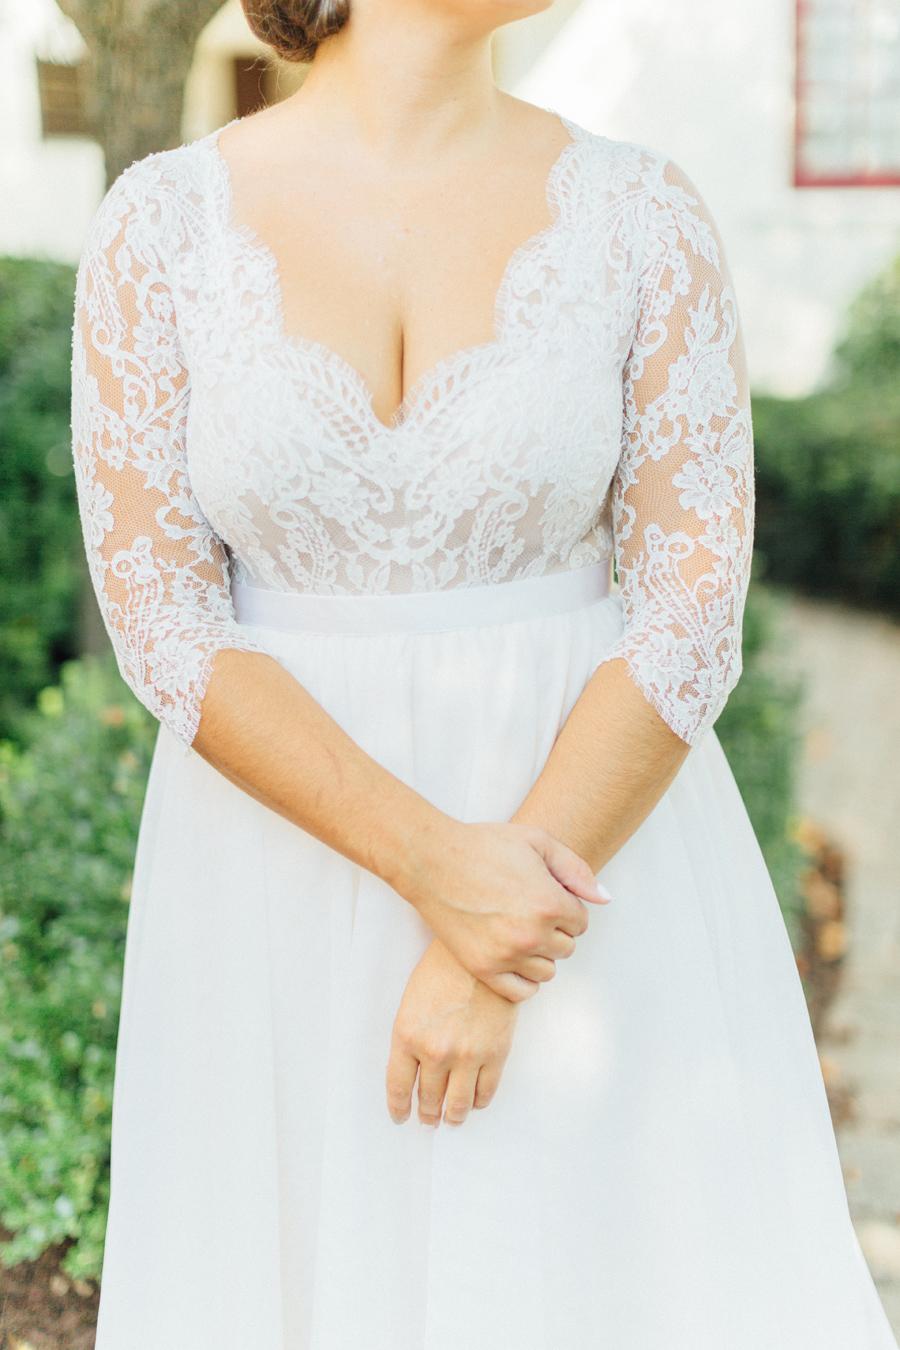 the-inn-at-leola-wedding-lancaster-pennsylvania-wedding-photographer-rebeka-viola-photograhy (18).jpg